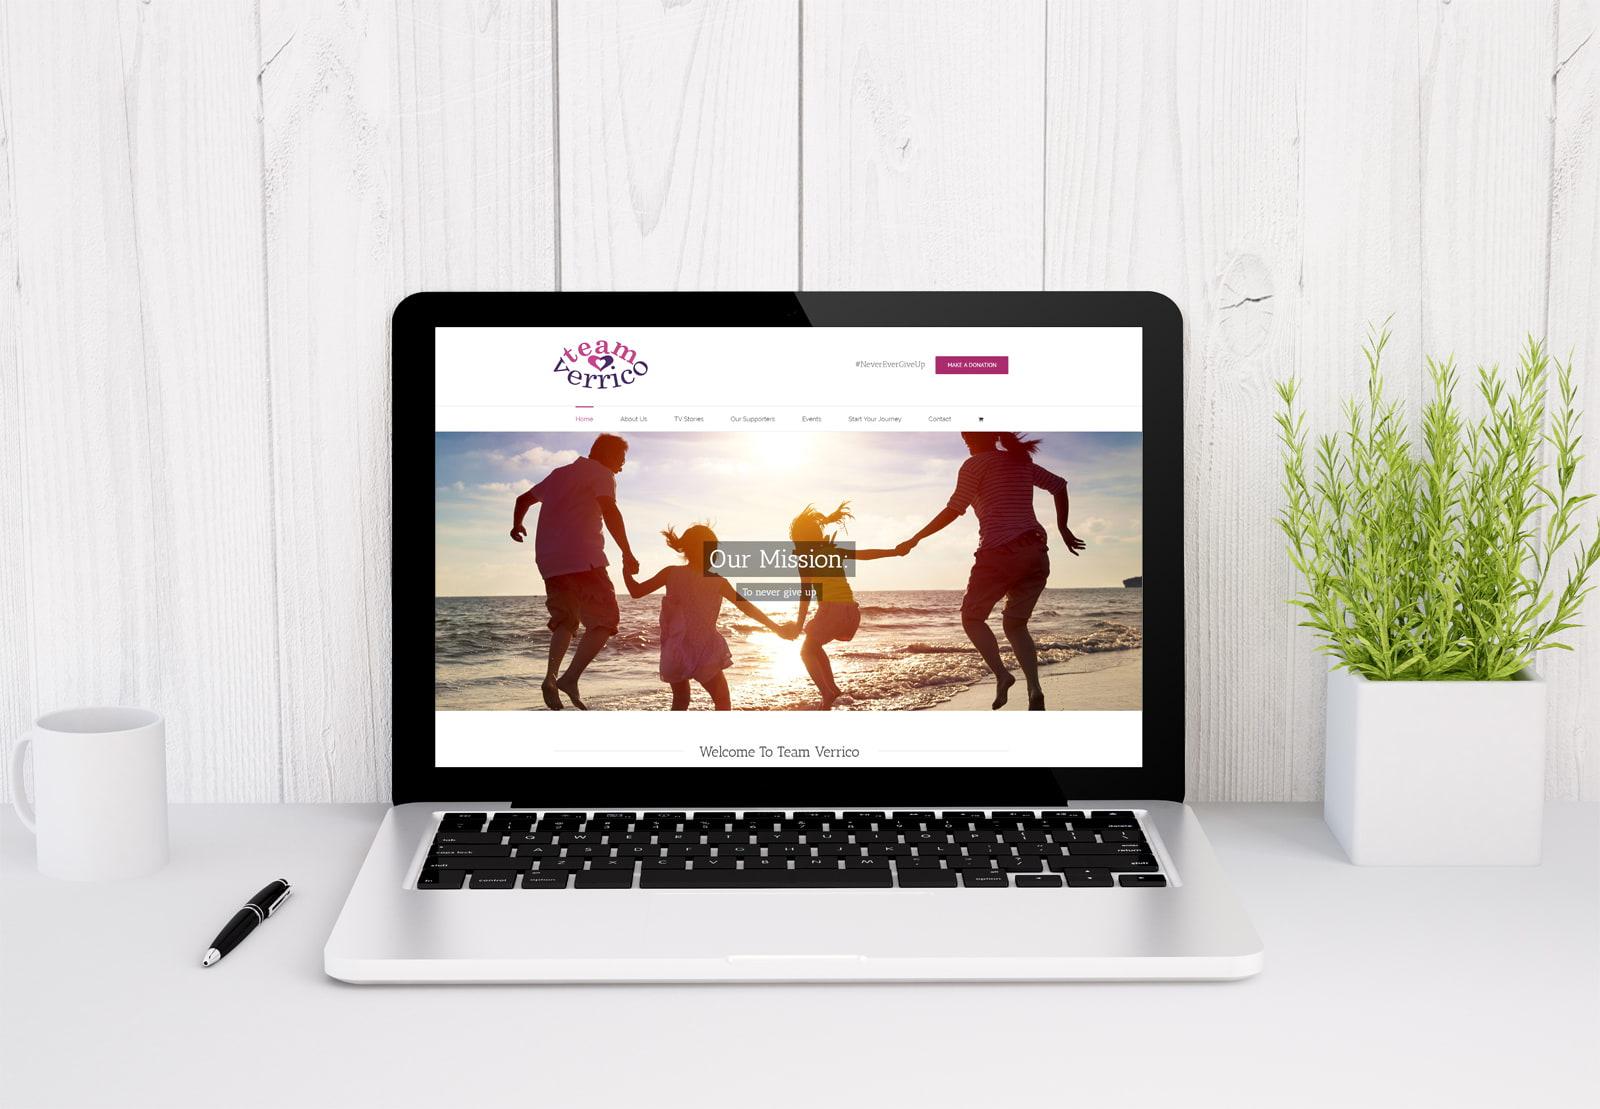 Who built the Team Verrico website - JJ Solutions